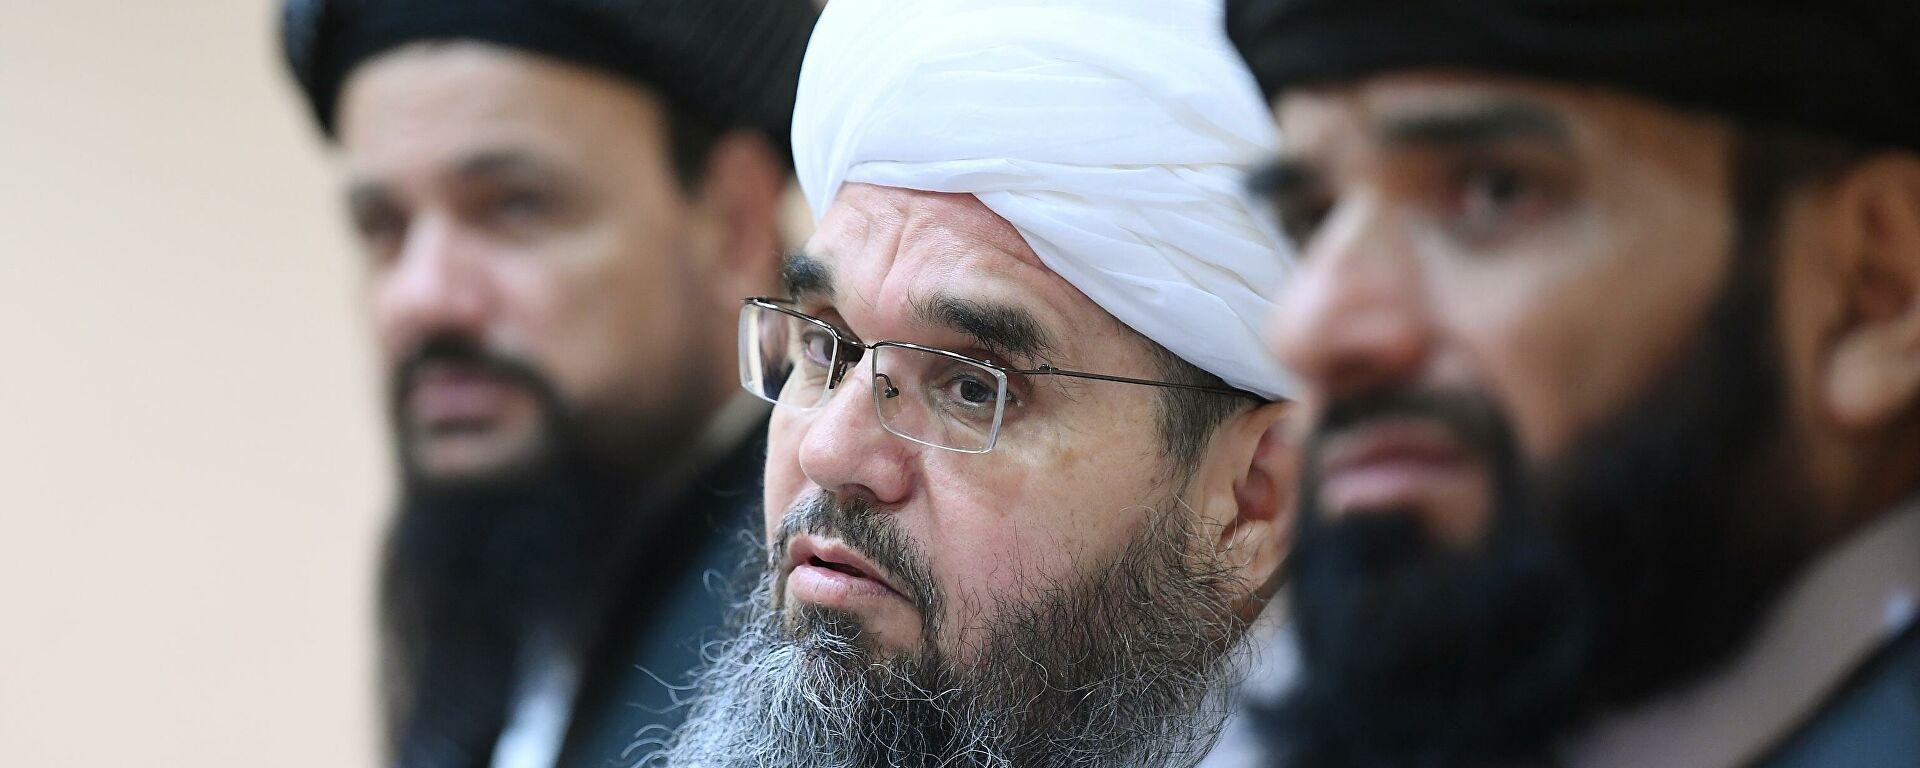 Представители политбюро «Талибана»